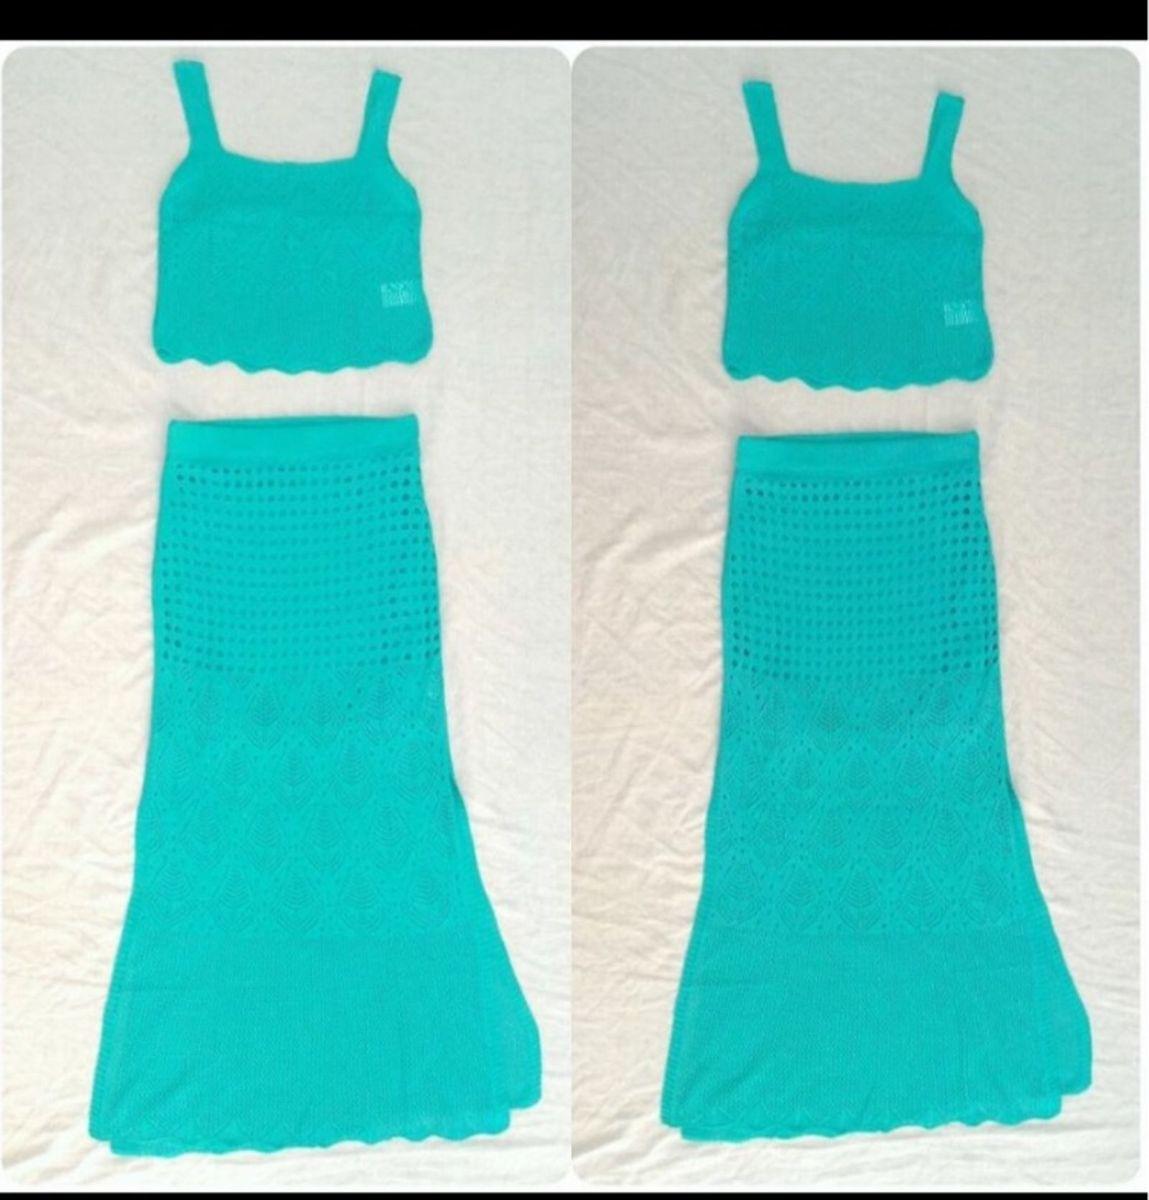 dd0194068 conjunto tricô tricot verde água tifanny cropped e saia longa - saias sem  marca